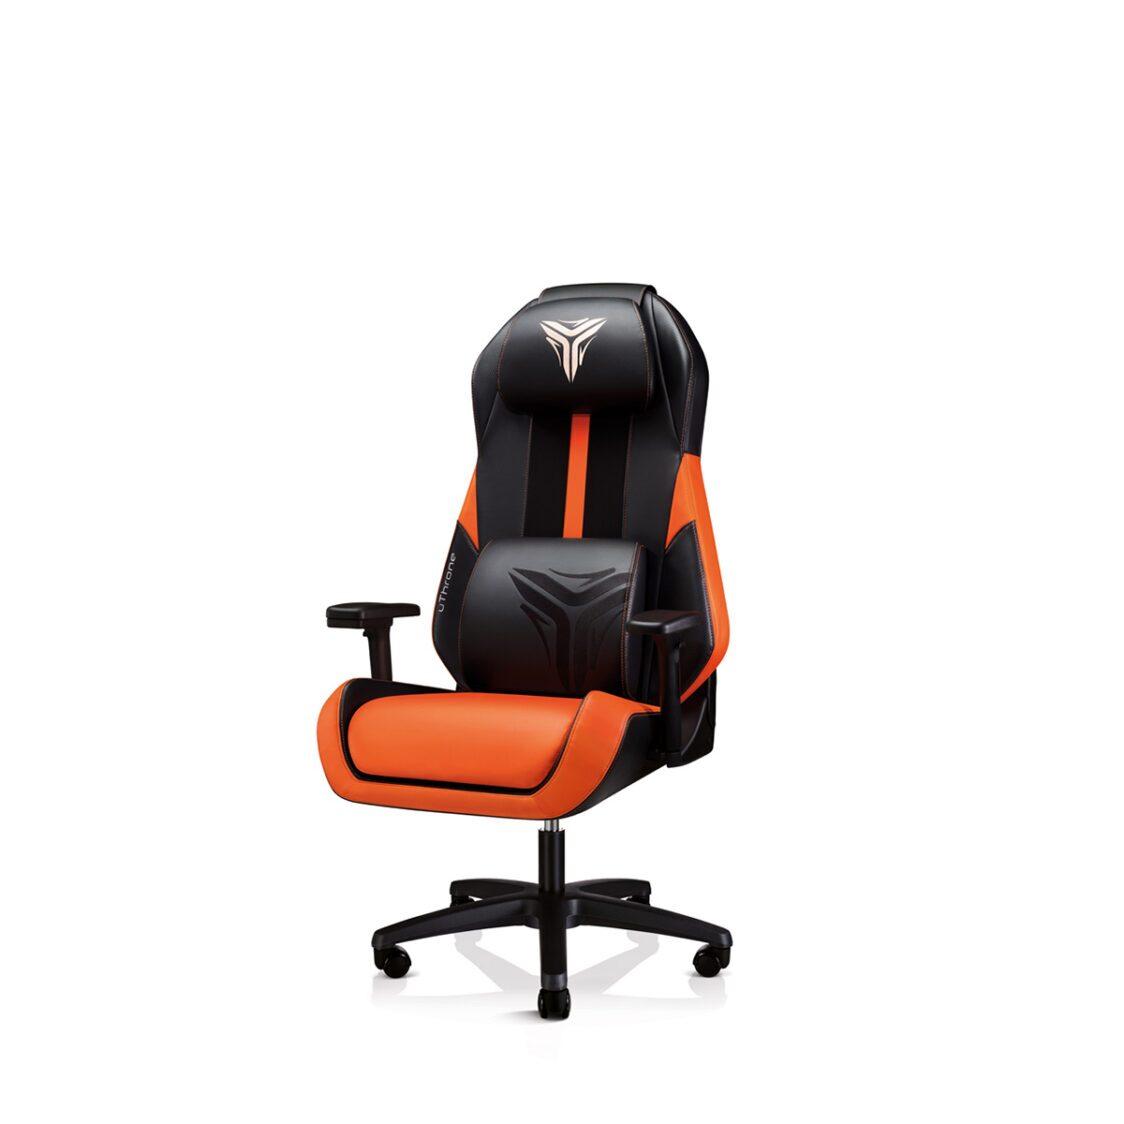 OSIM uThrone Gaming Chair Orange